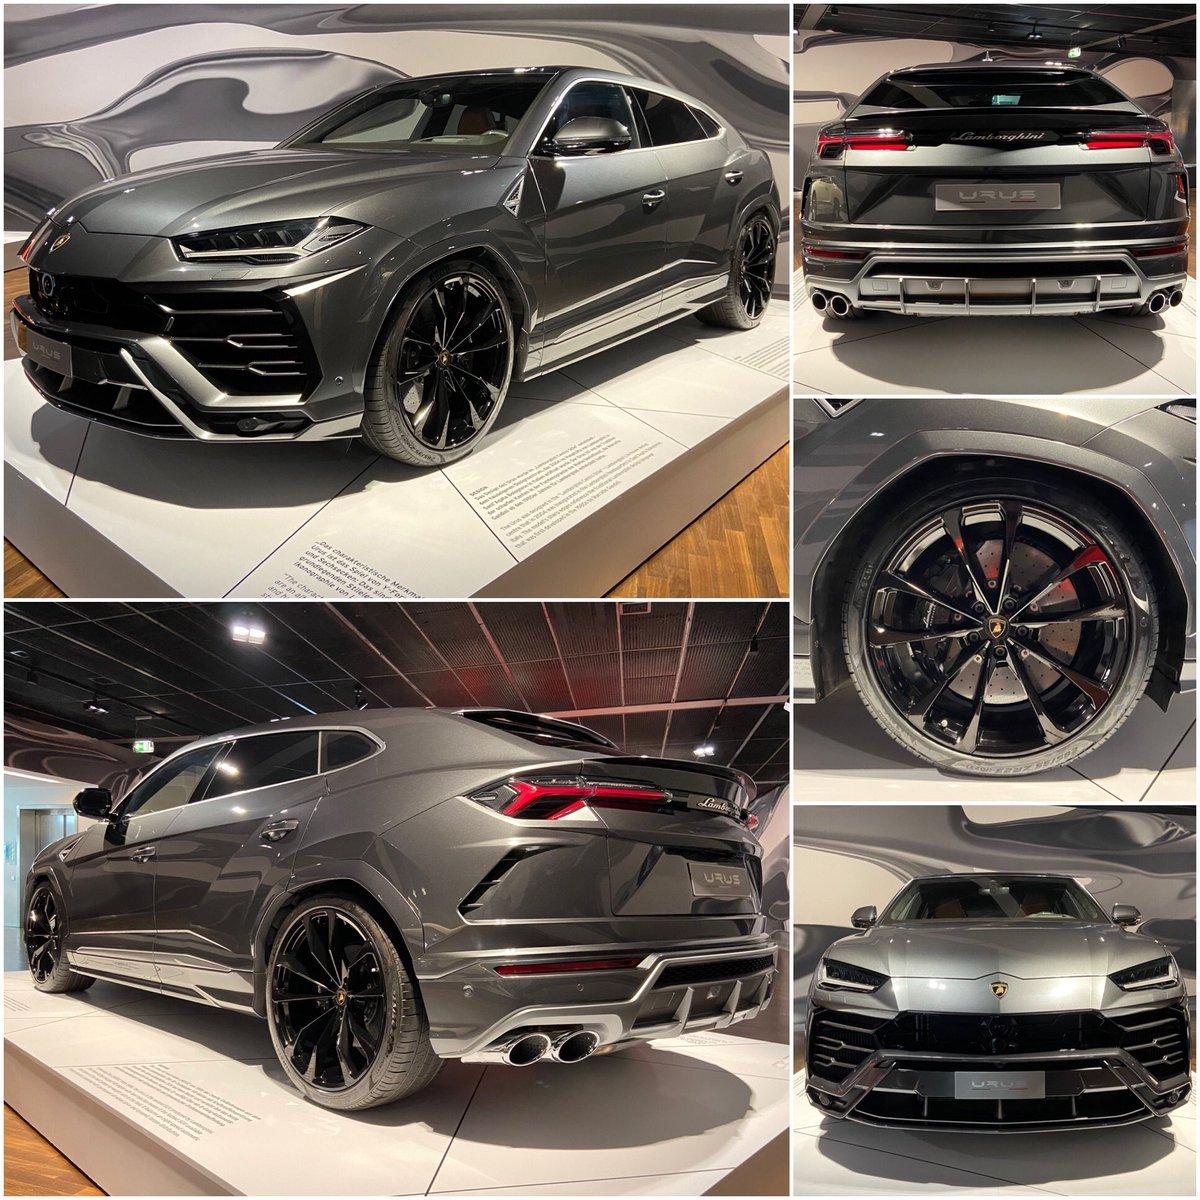 Lamborghini Urus (2019)  #vw #autostadt #lamborghini #suv #lamborghiniurus #lamborghini_daily #urus #huracan #diablo #murcielago #aventador #countach #v8 #biturbo #lambolove #lambos #supertweaks #carspotter #caroftheday #itswhitenoise #mansory - https://t.co/1dHDjqtFPq https://t.co/PcFtIchrBa